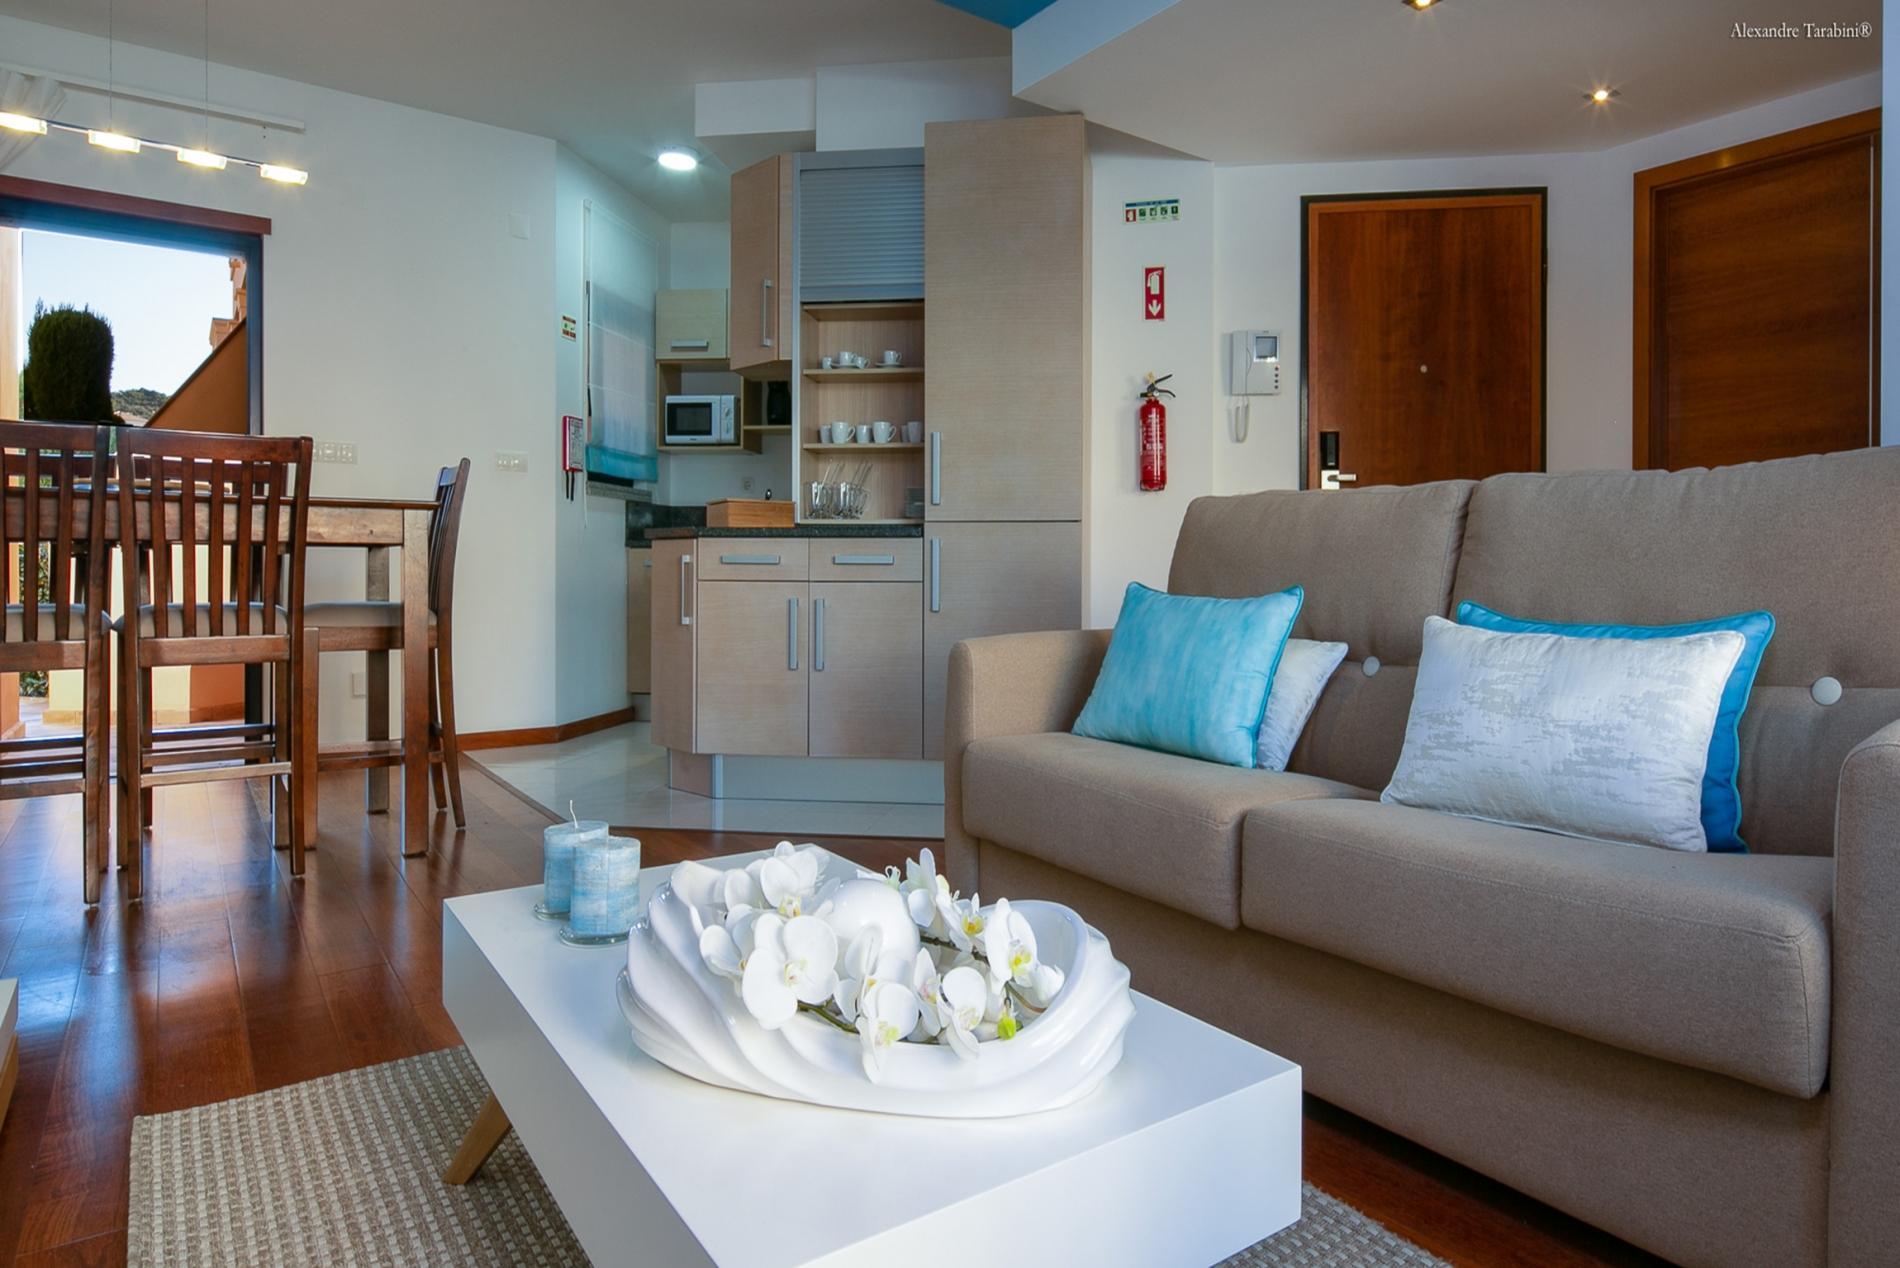 Ferienwohnung A24 - LuzBay Beach Apartment (2558091), Luz, , Algarve, Portugal, Bild 2